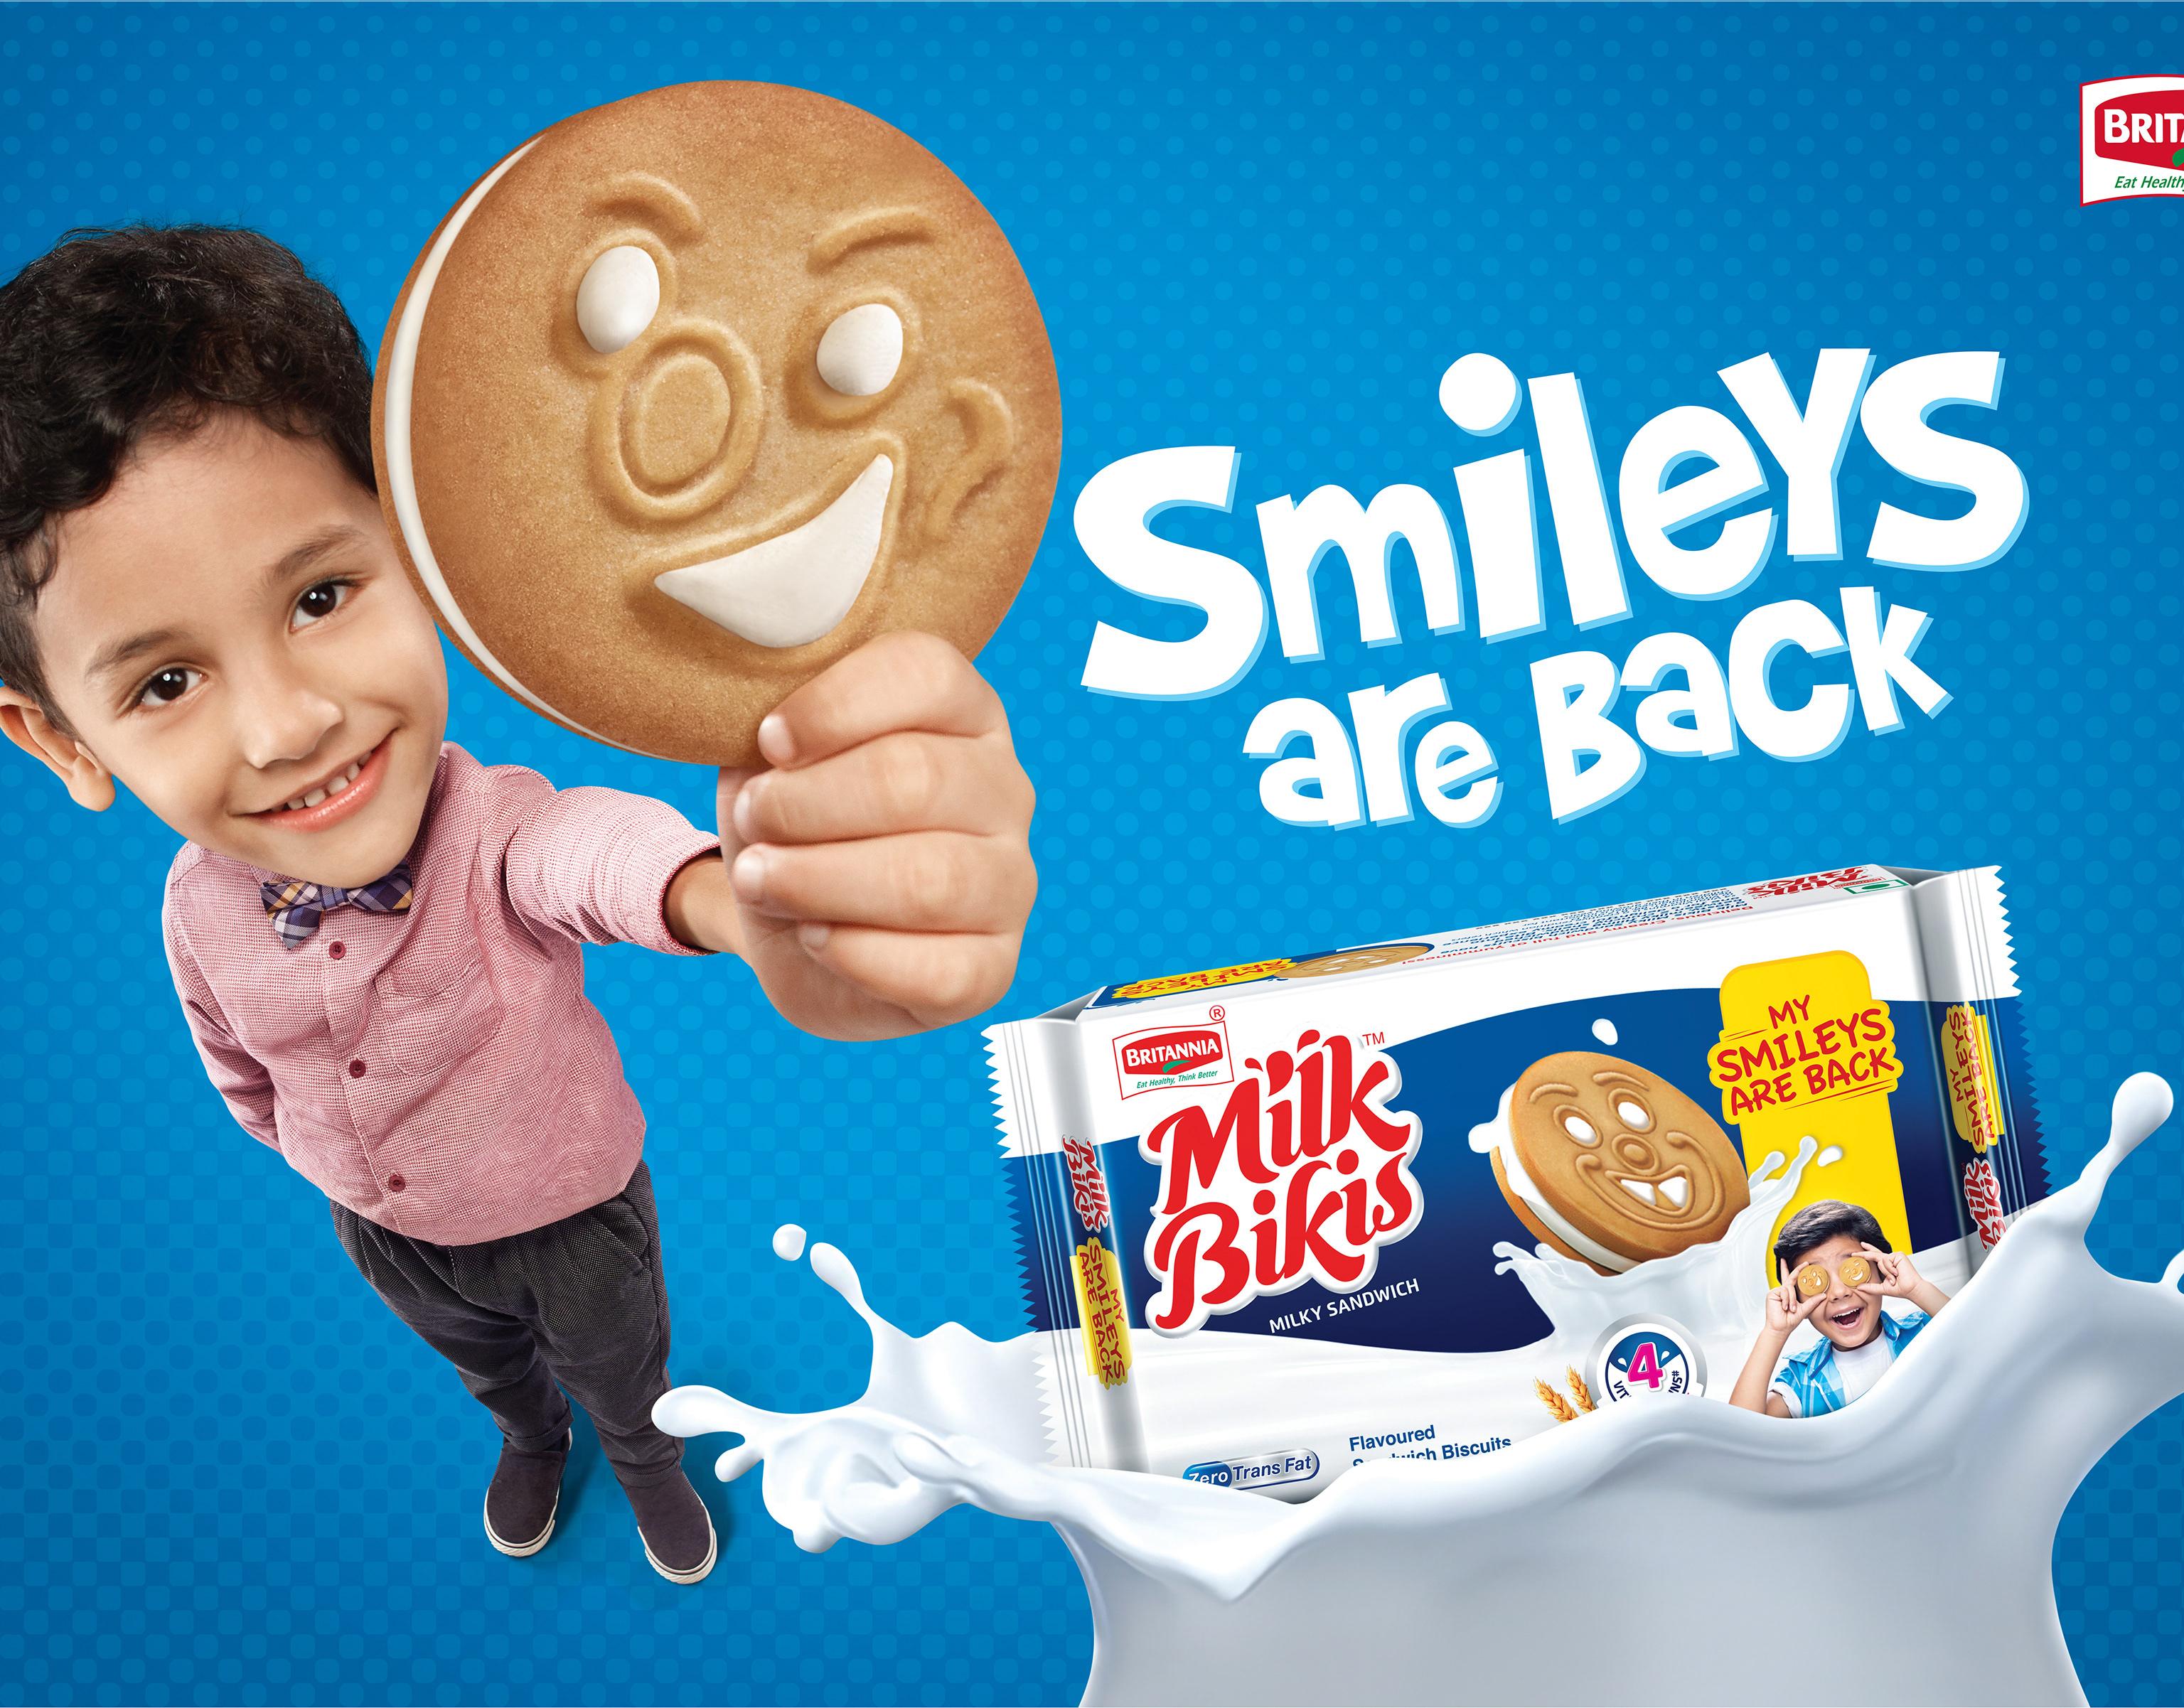 milk bikis meet suriya actor